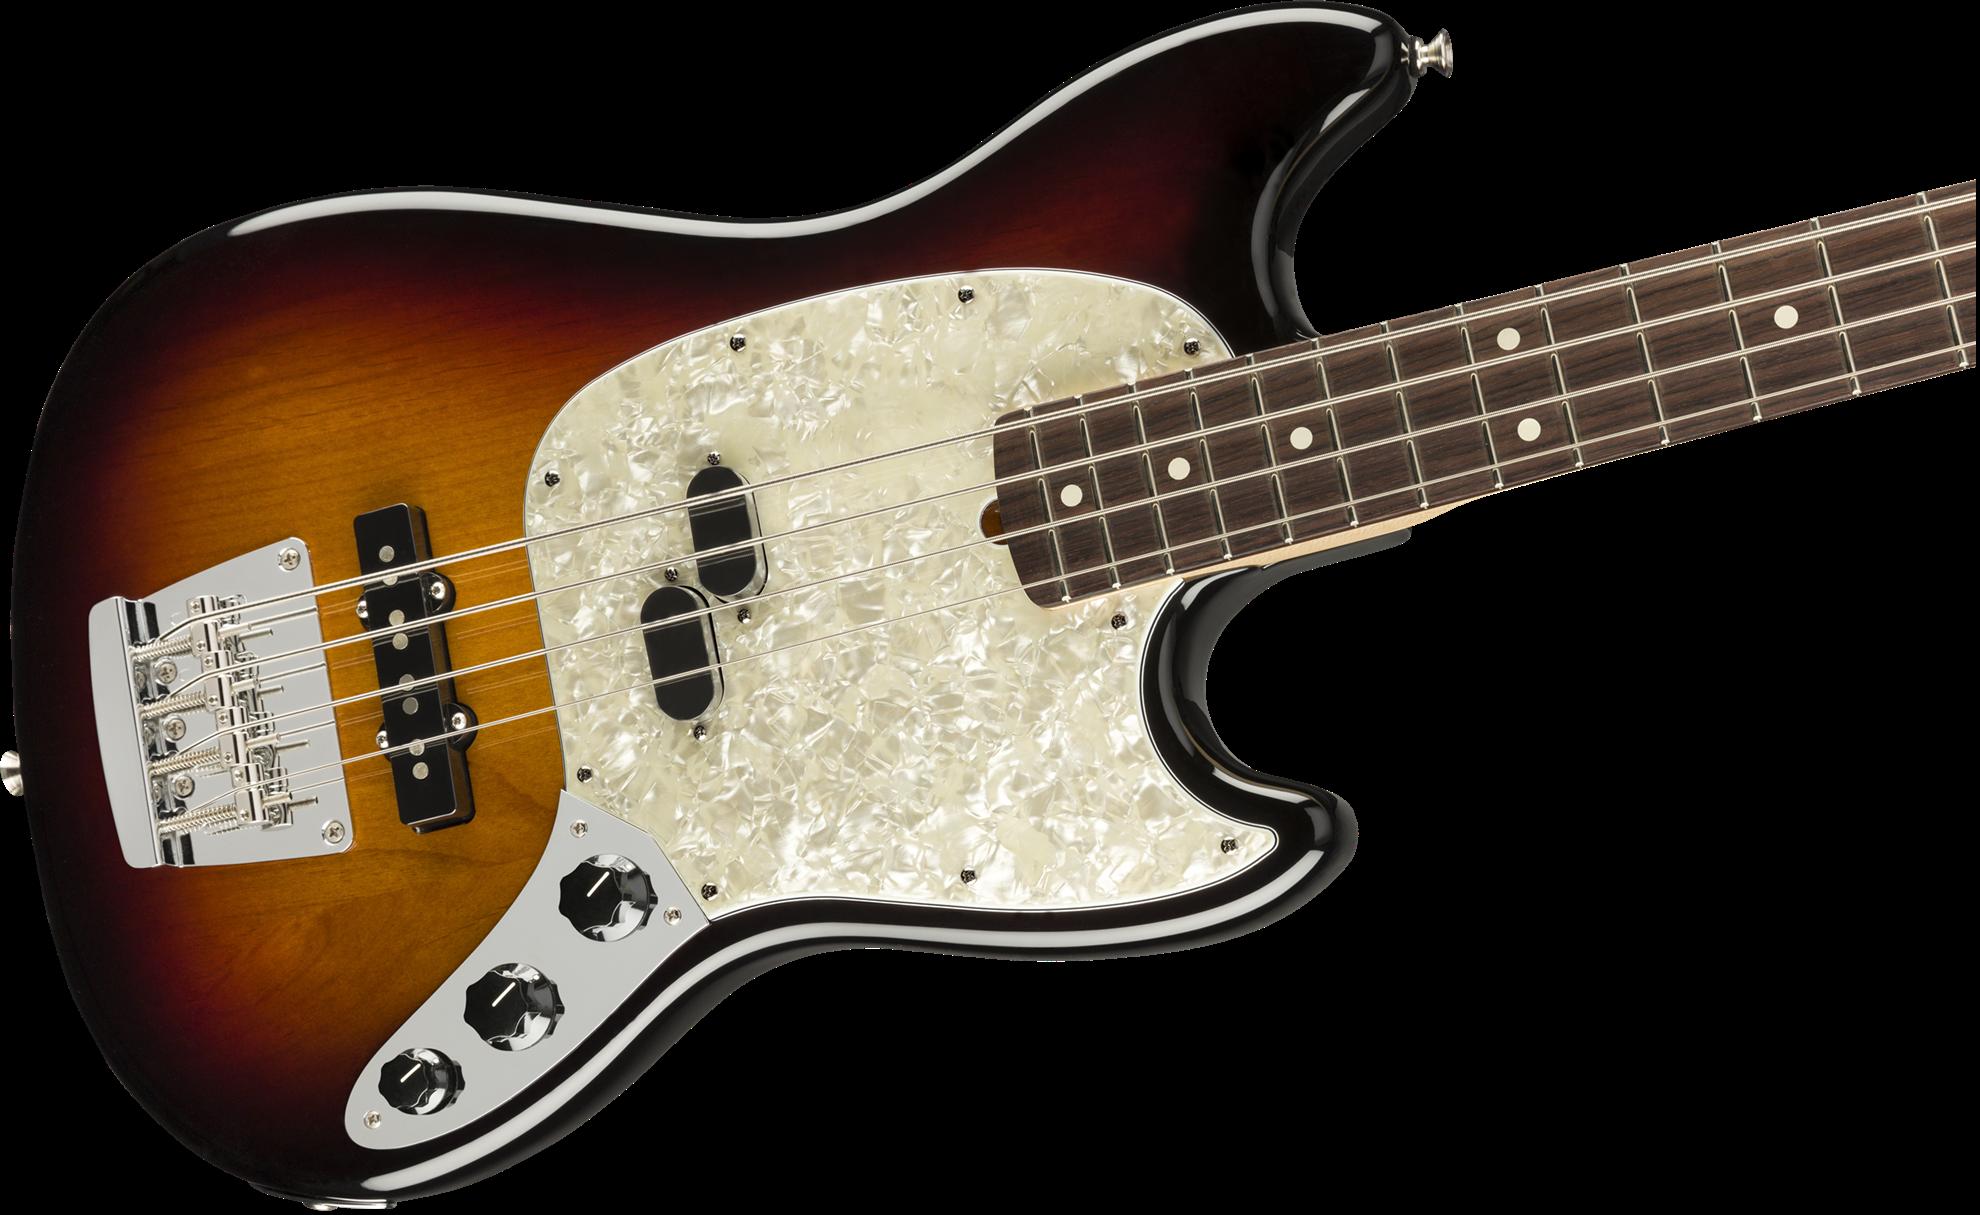 Fender American Performer Mustang Bass Electric Guitar - Rosewood Neck - 3-Color Sunburst